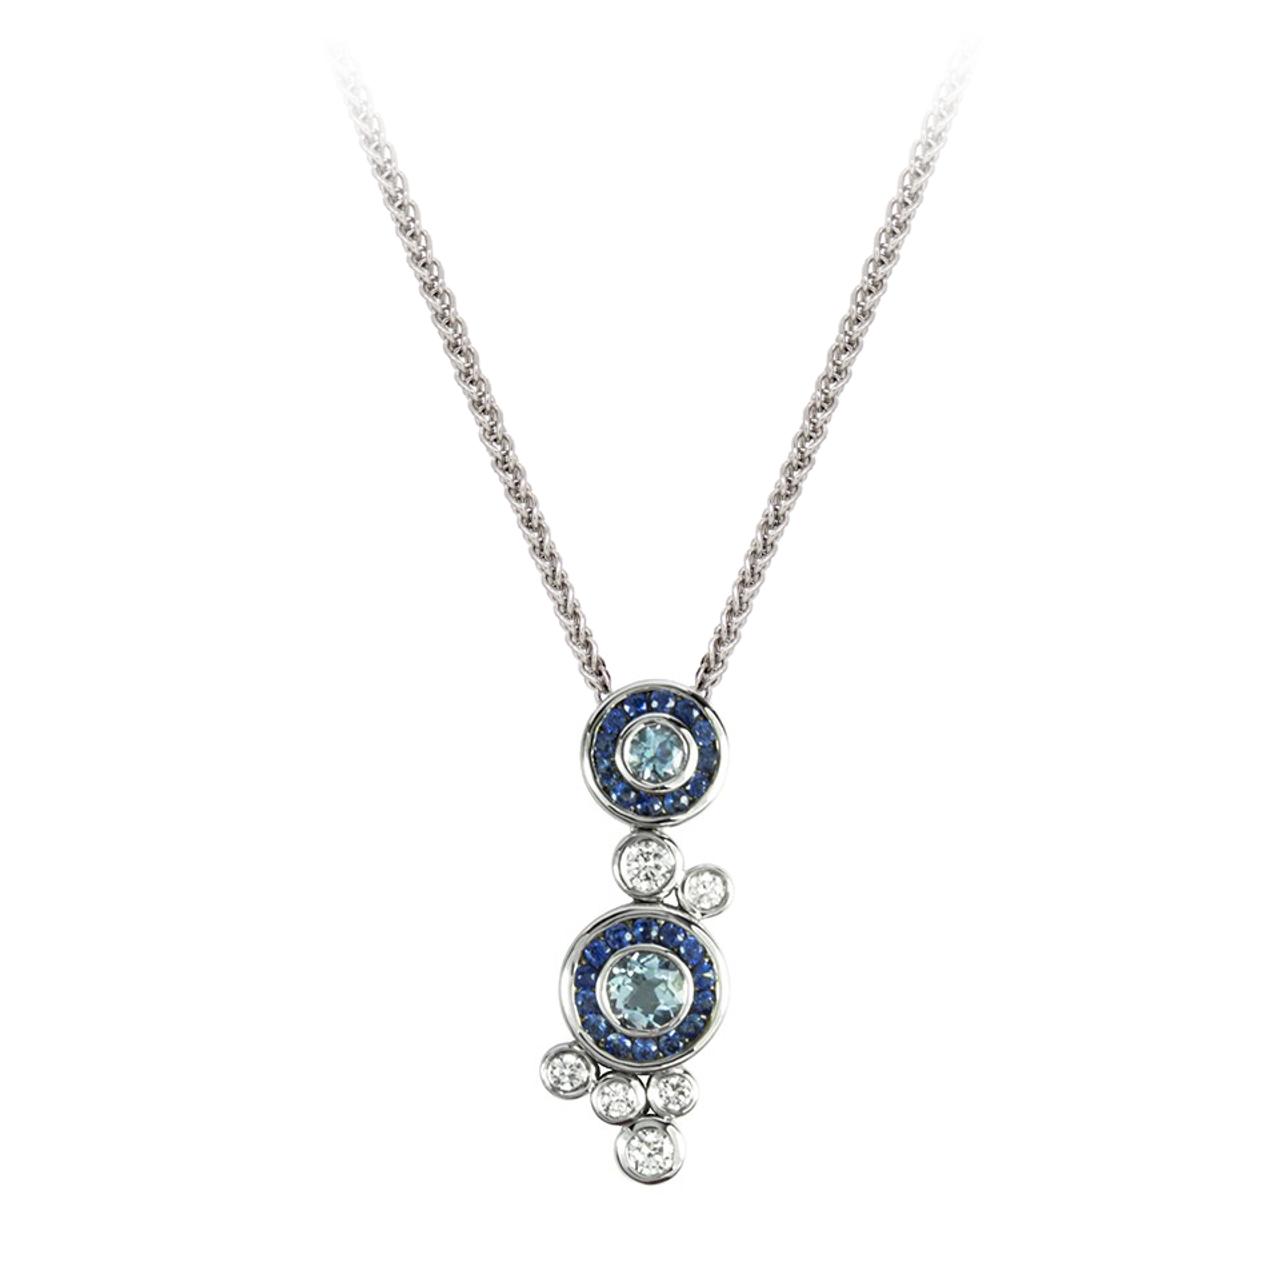 18ct White Gold Dewdrop Pendant & Chain